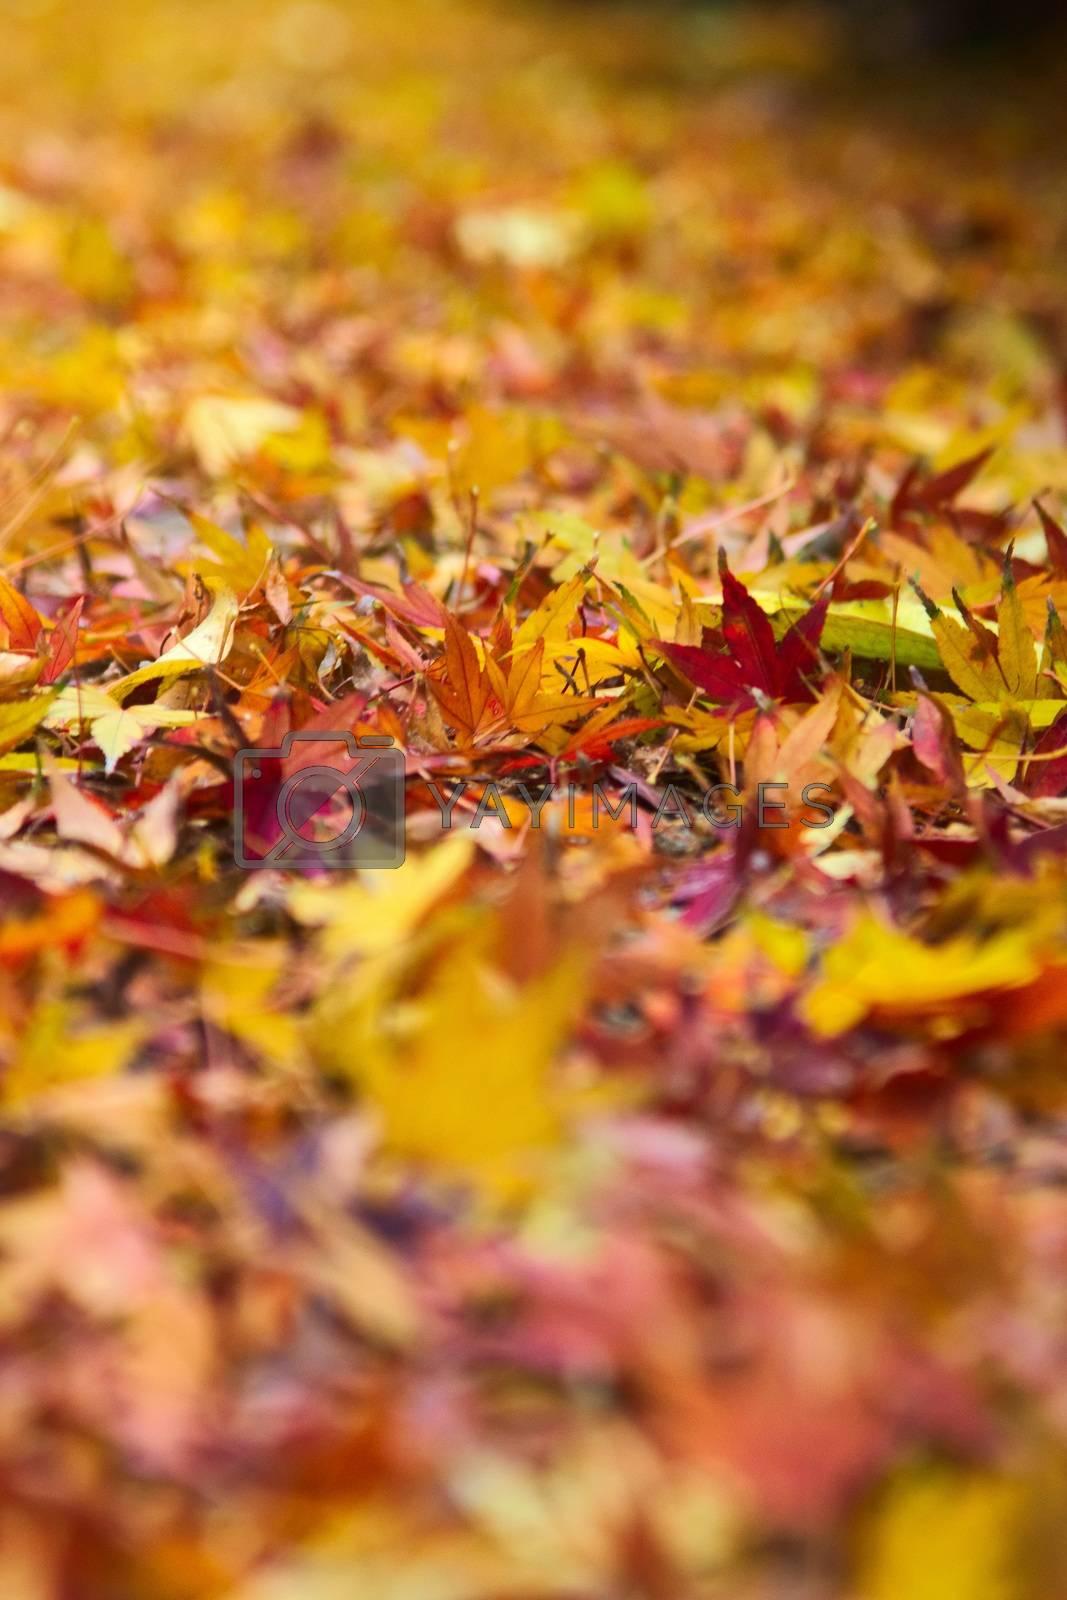 Royalty free image of Yellow, orange autum maple leaves. Seasonal background. by hernan_hyper